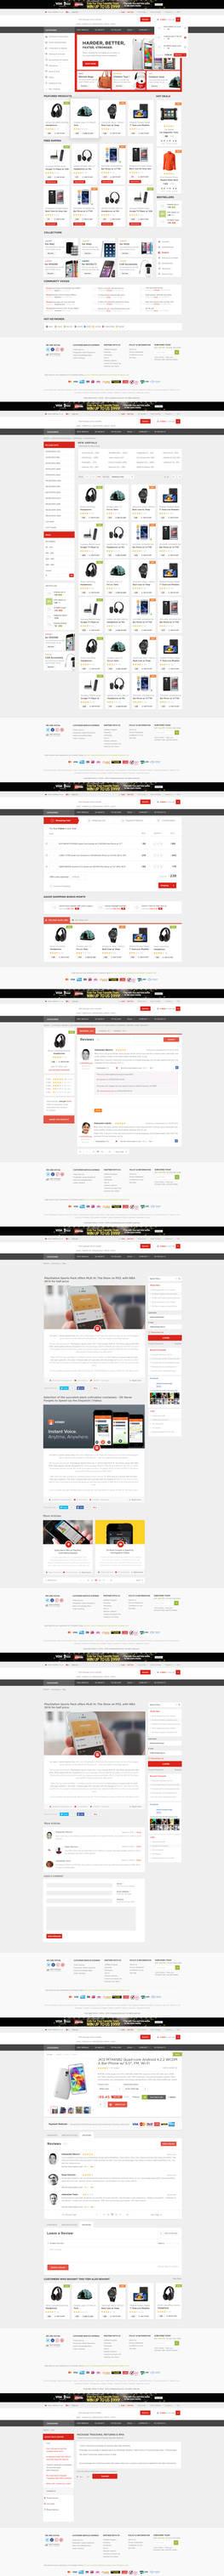 Ecommerce Shop Web Design For Sale